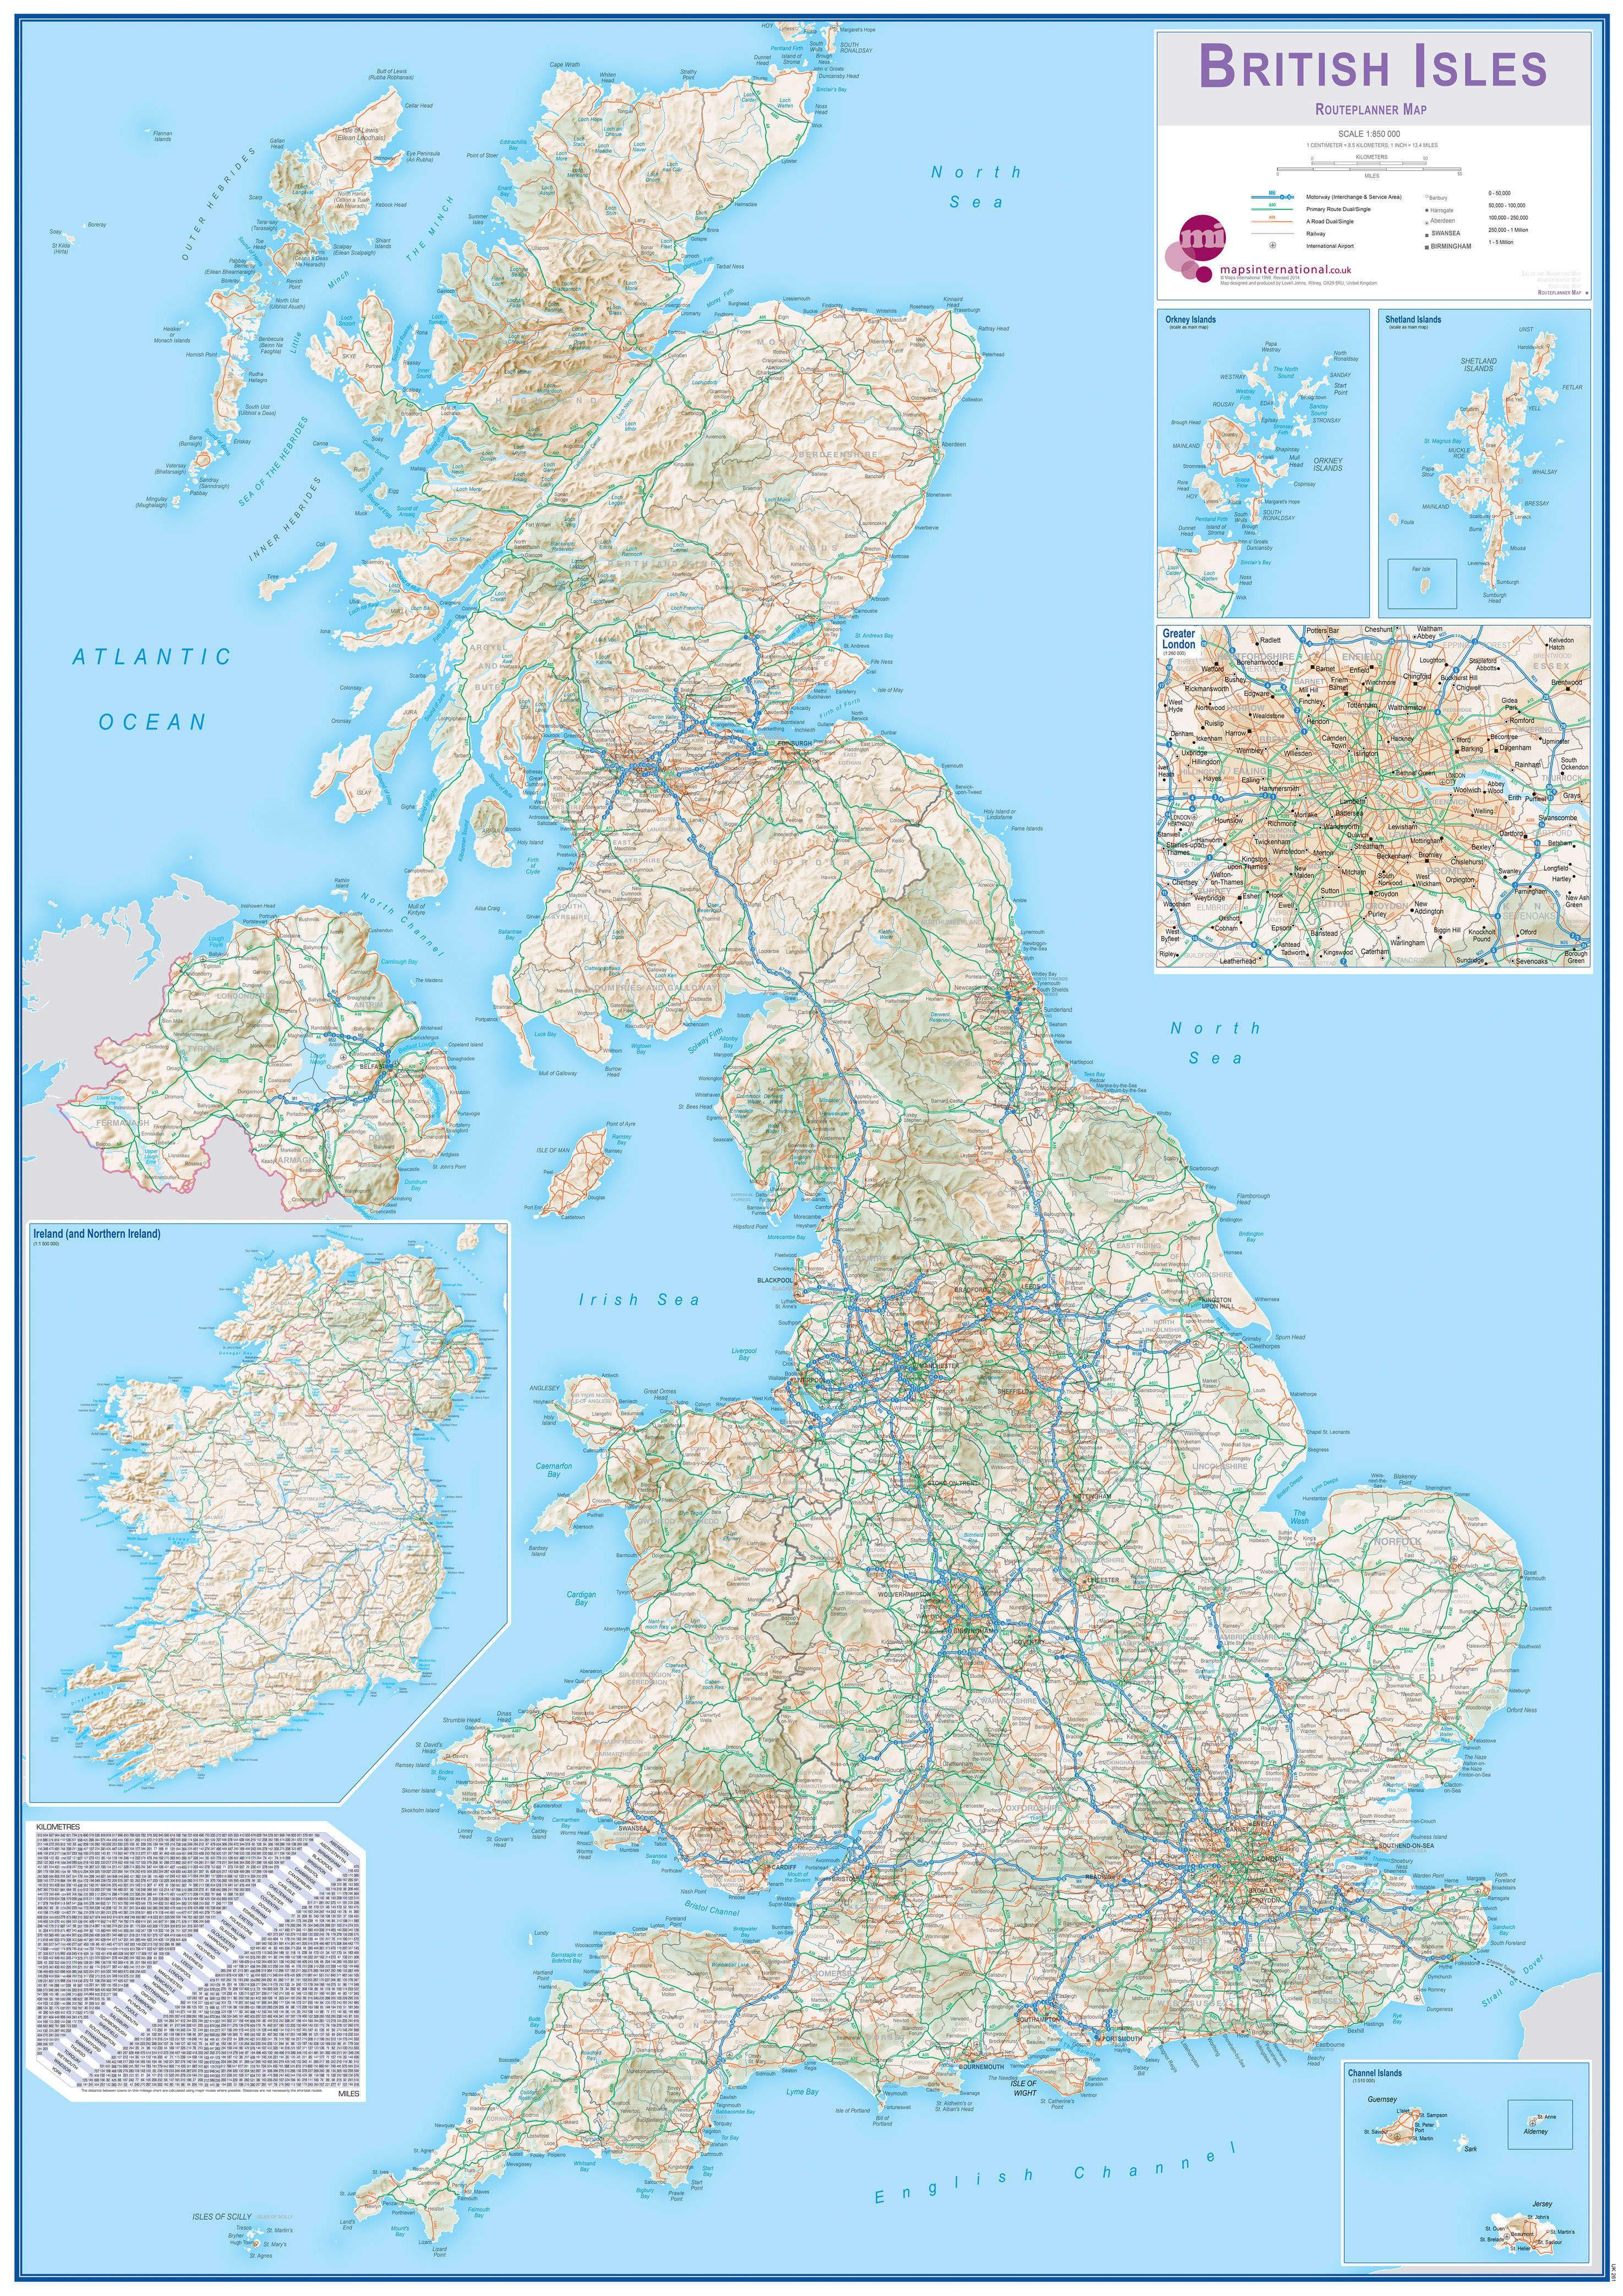 British Isles Routeplanning Map